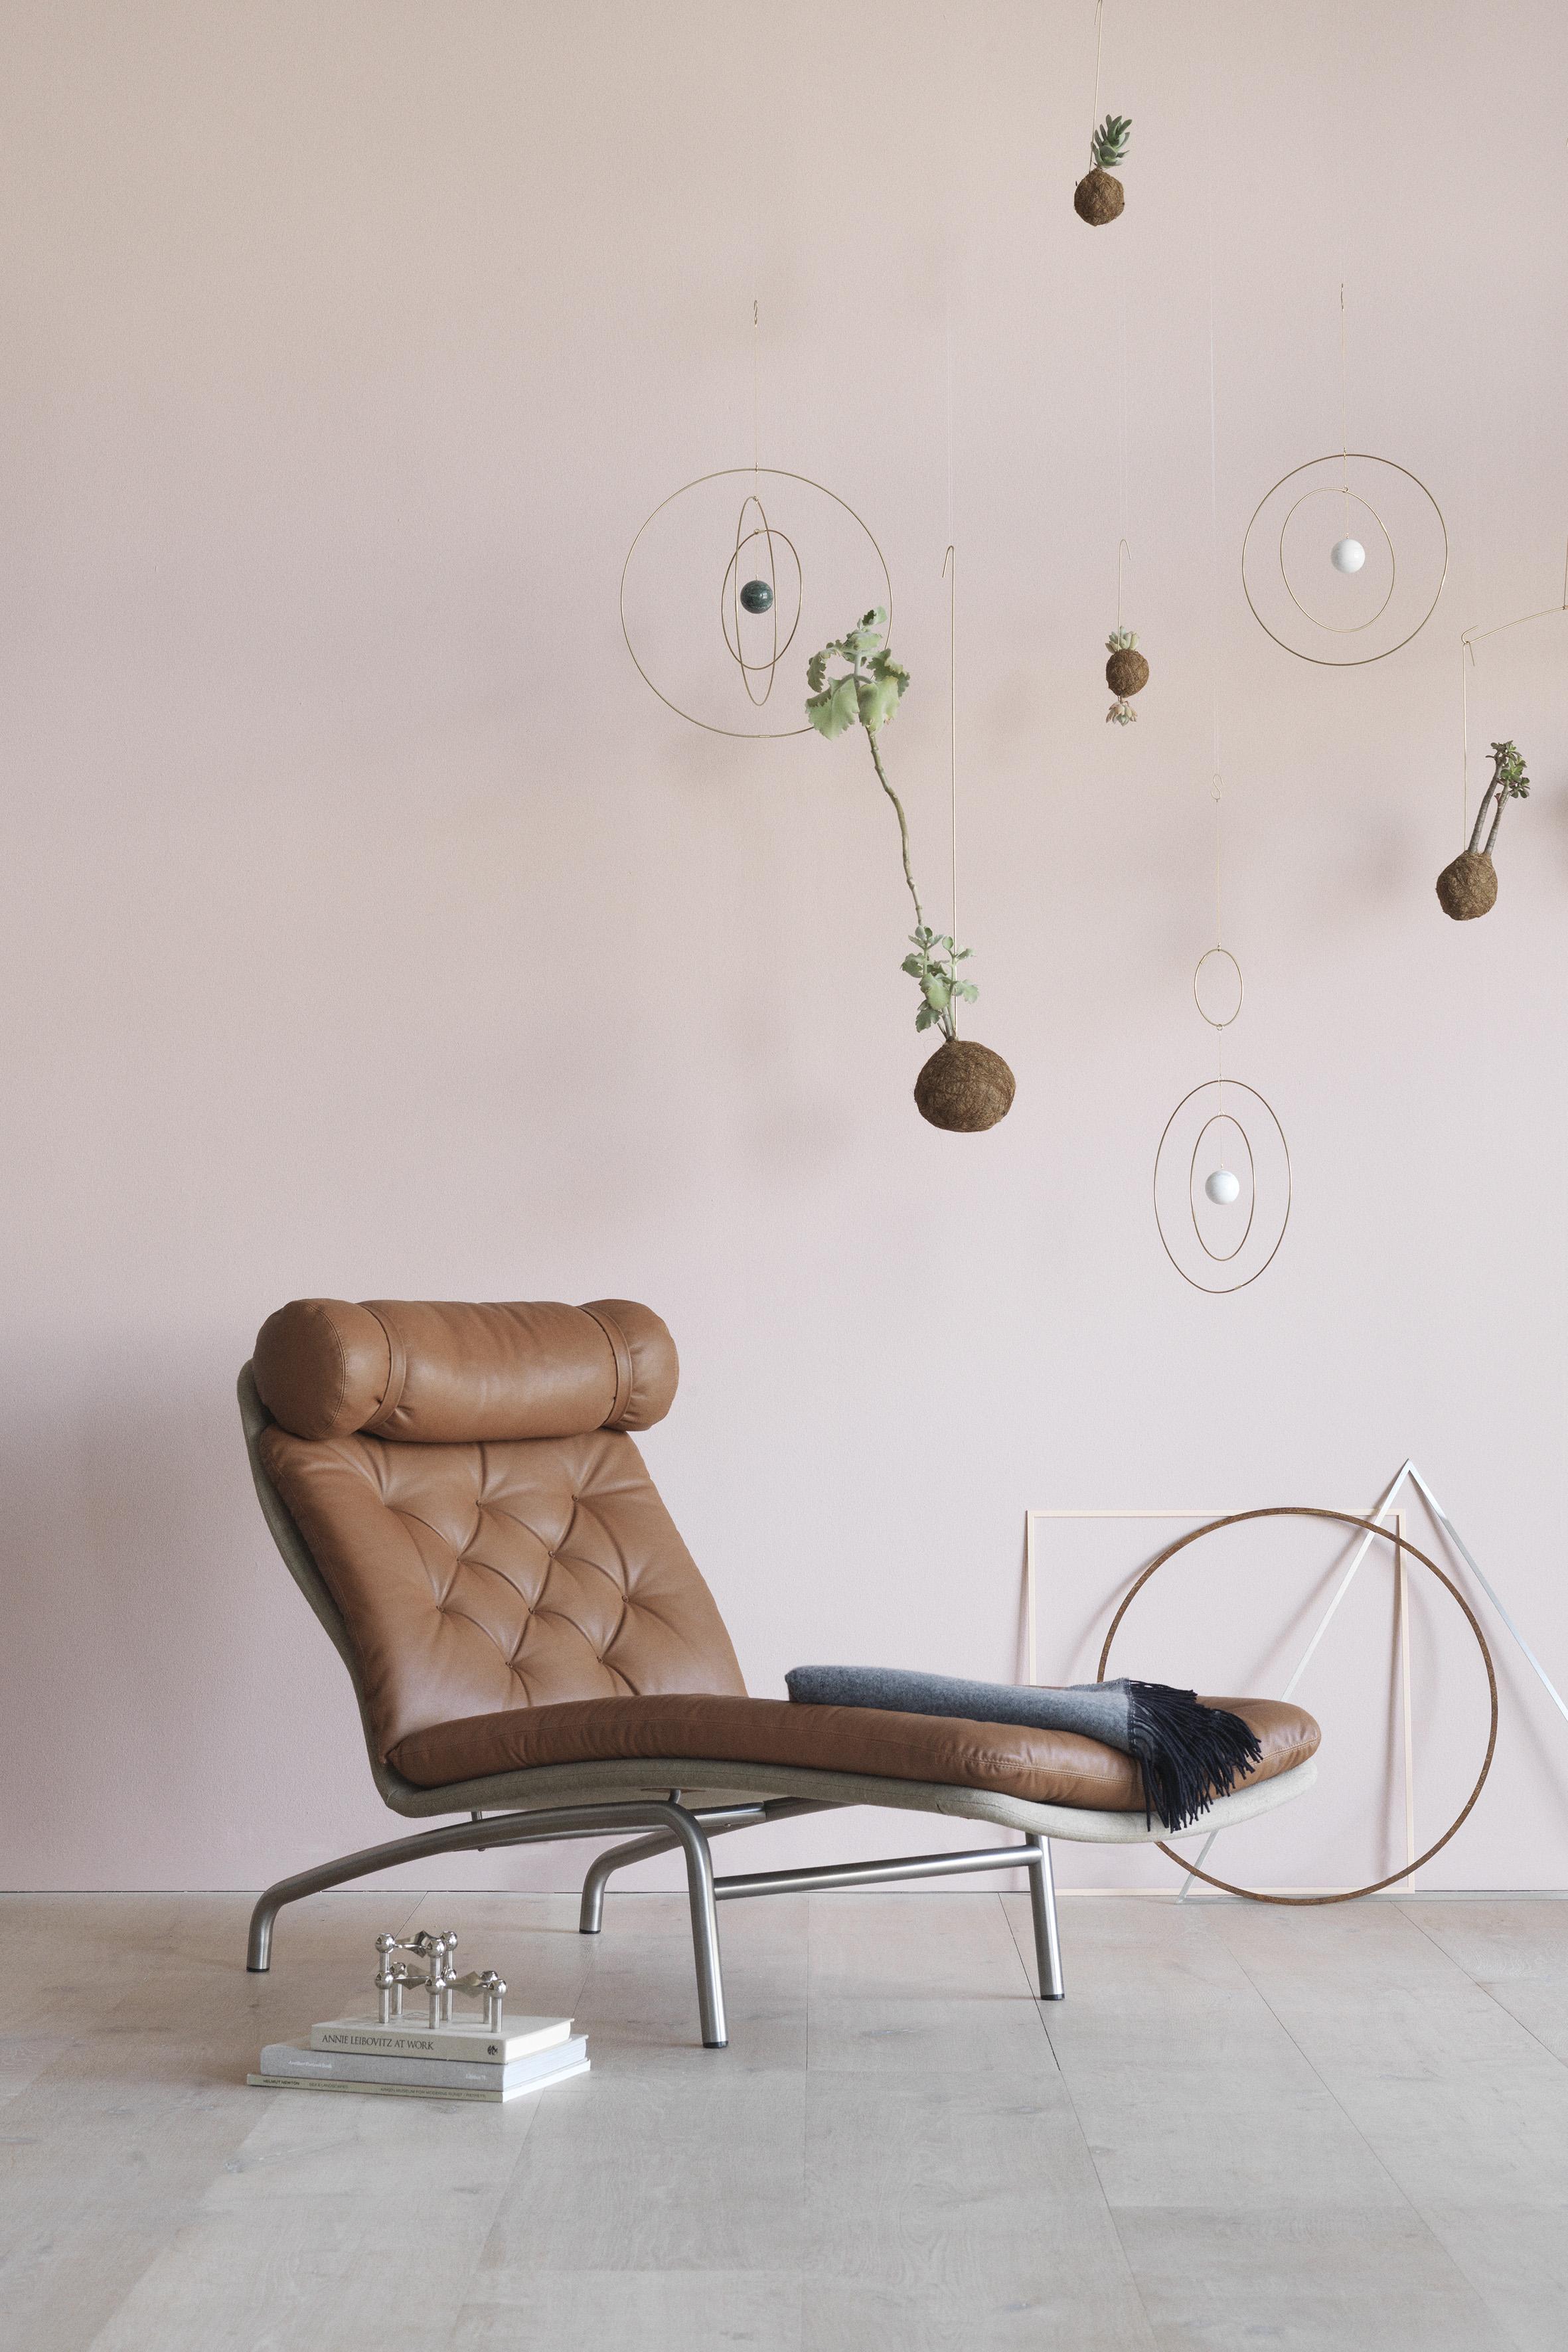 photo erik jrgensen 2 - Nordic Design Chaise